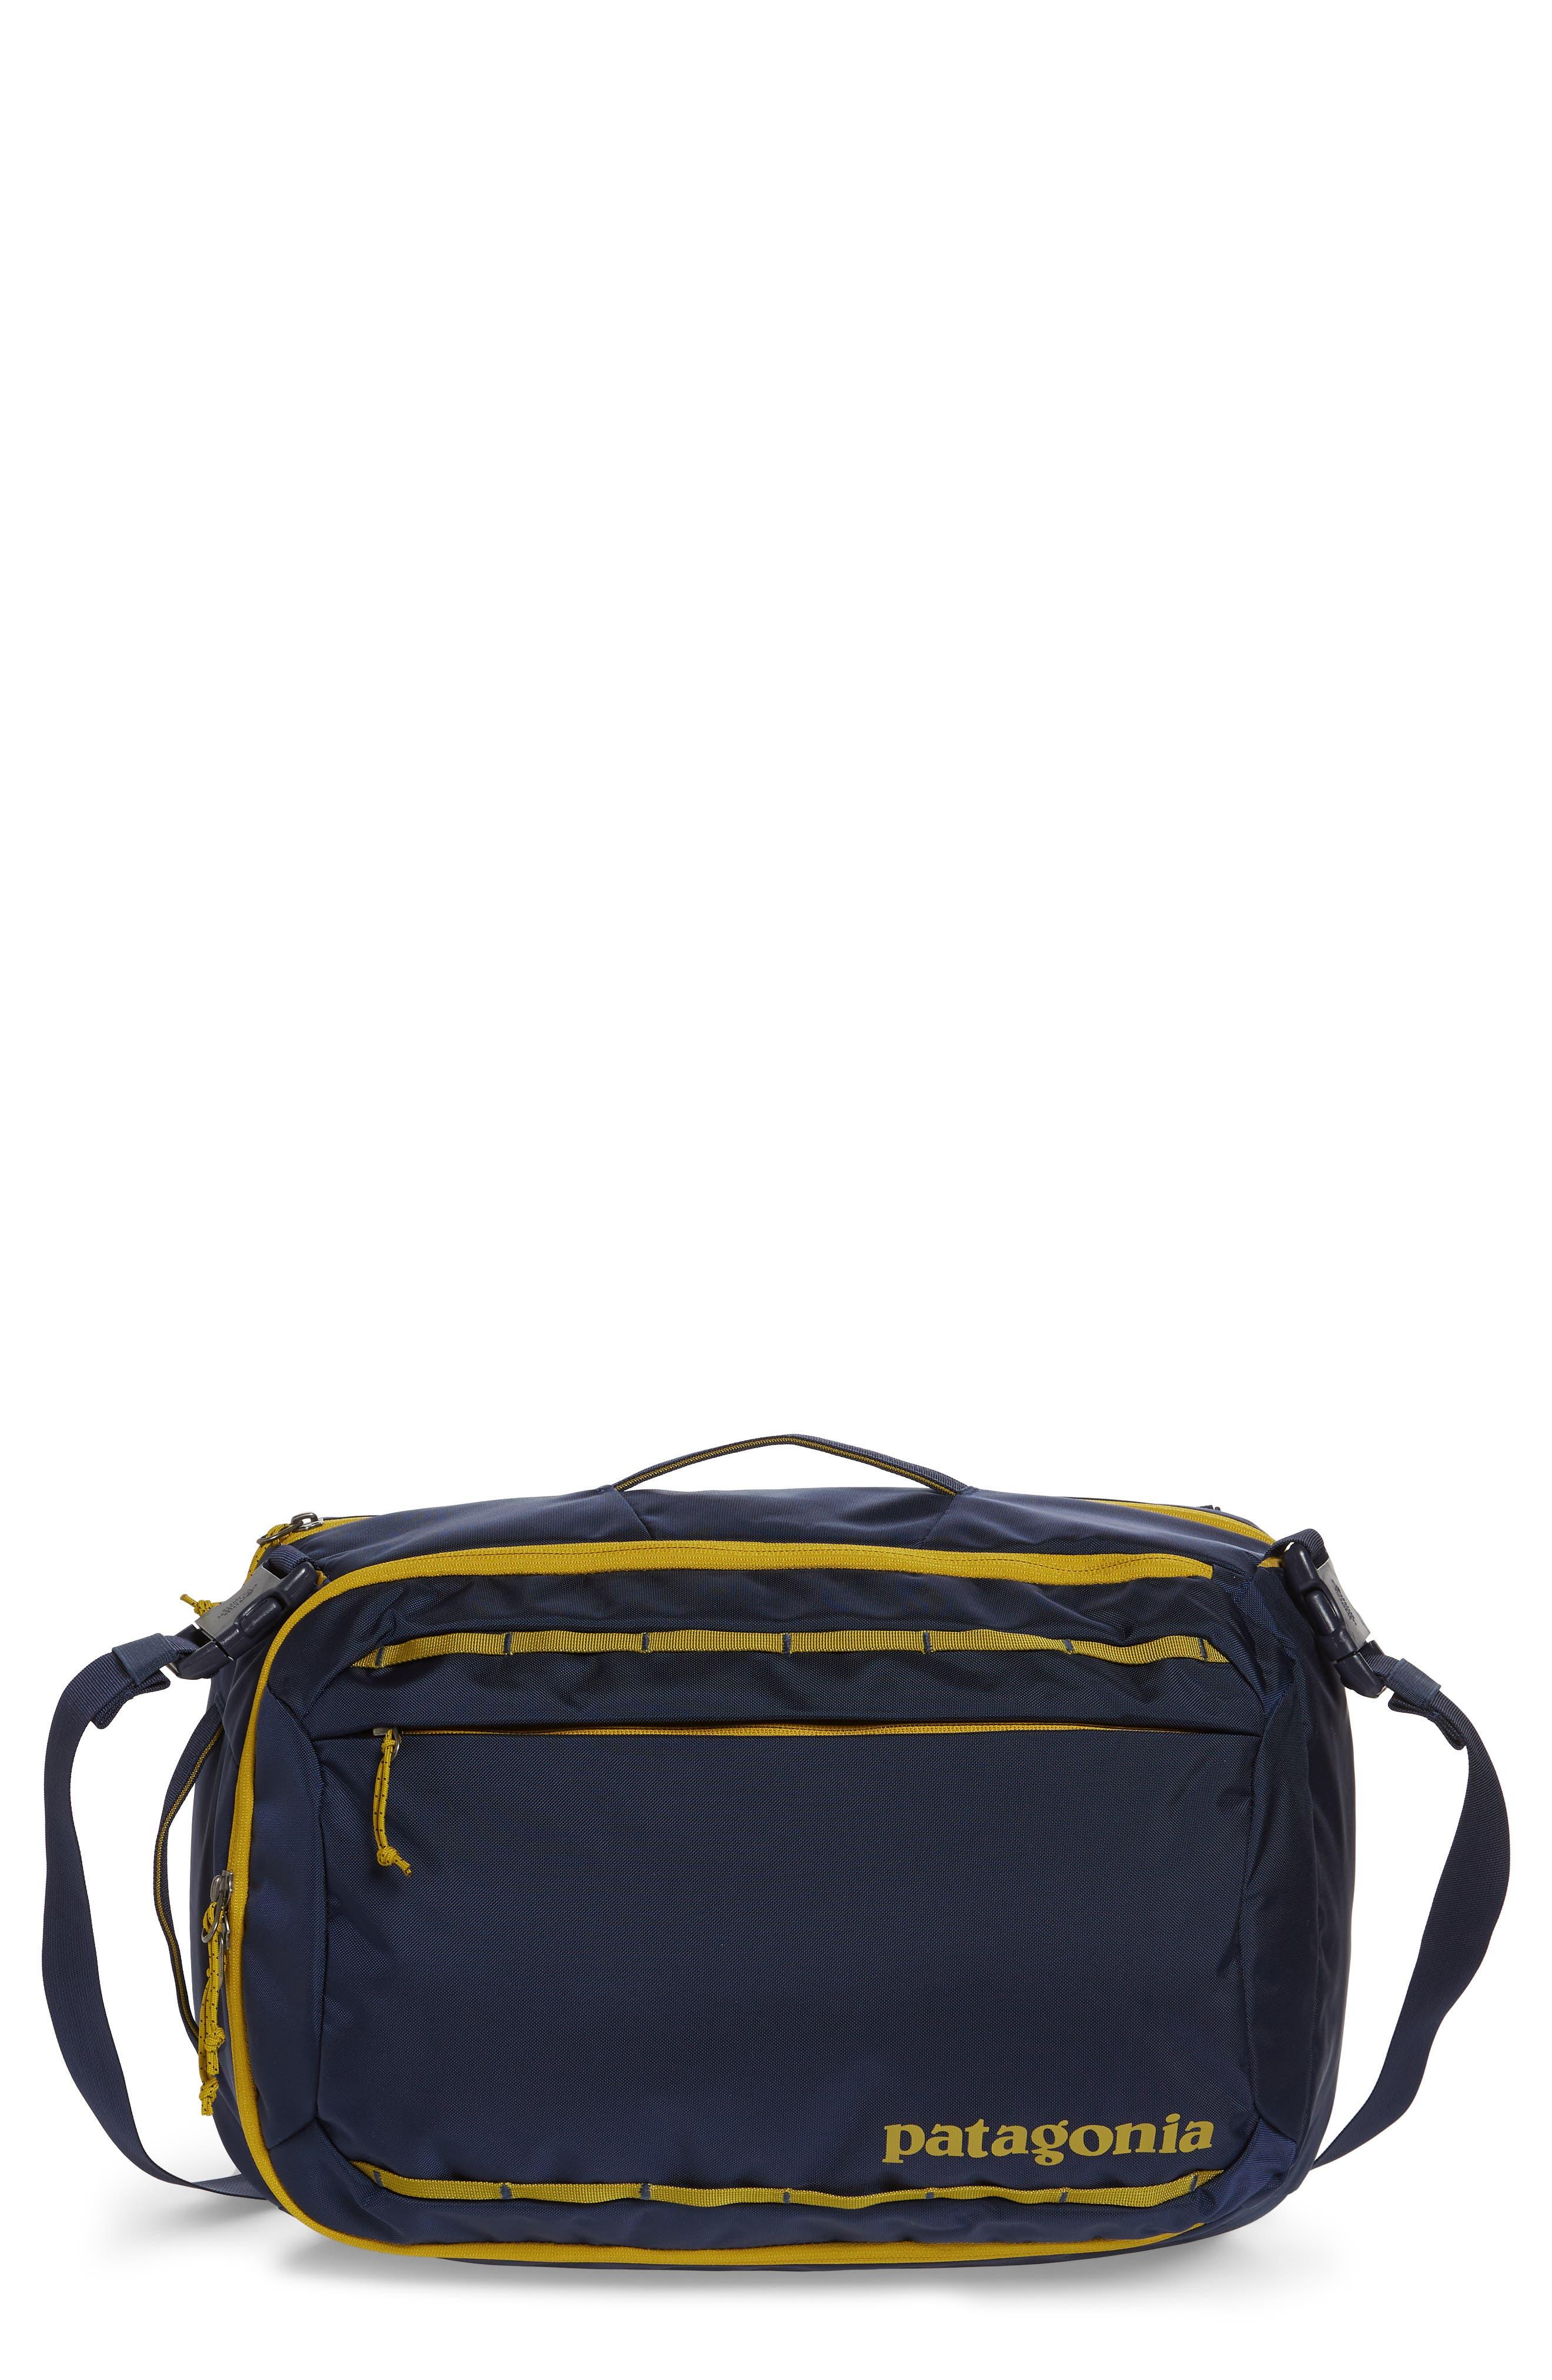 PATAGONIA,                             Tres 25-Liter Convertible Backpack,                             Main thumbnail 1, color,                             CLASSIC NAVY